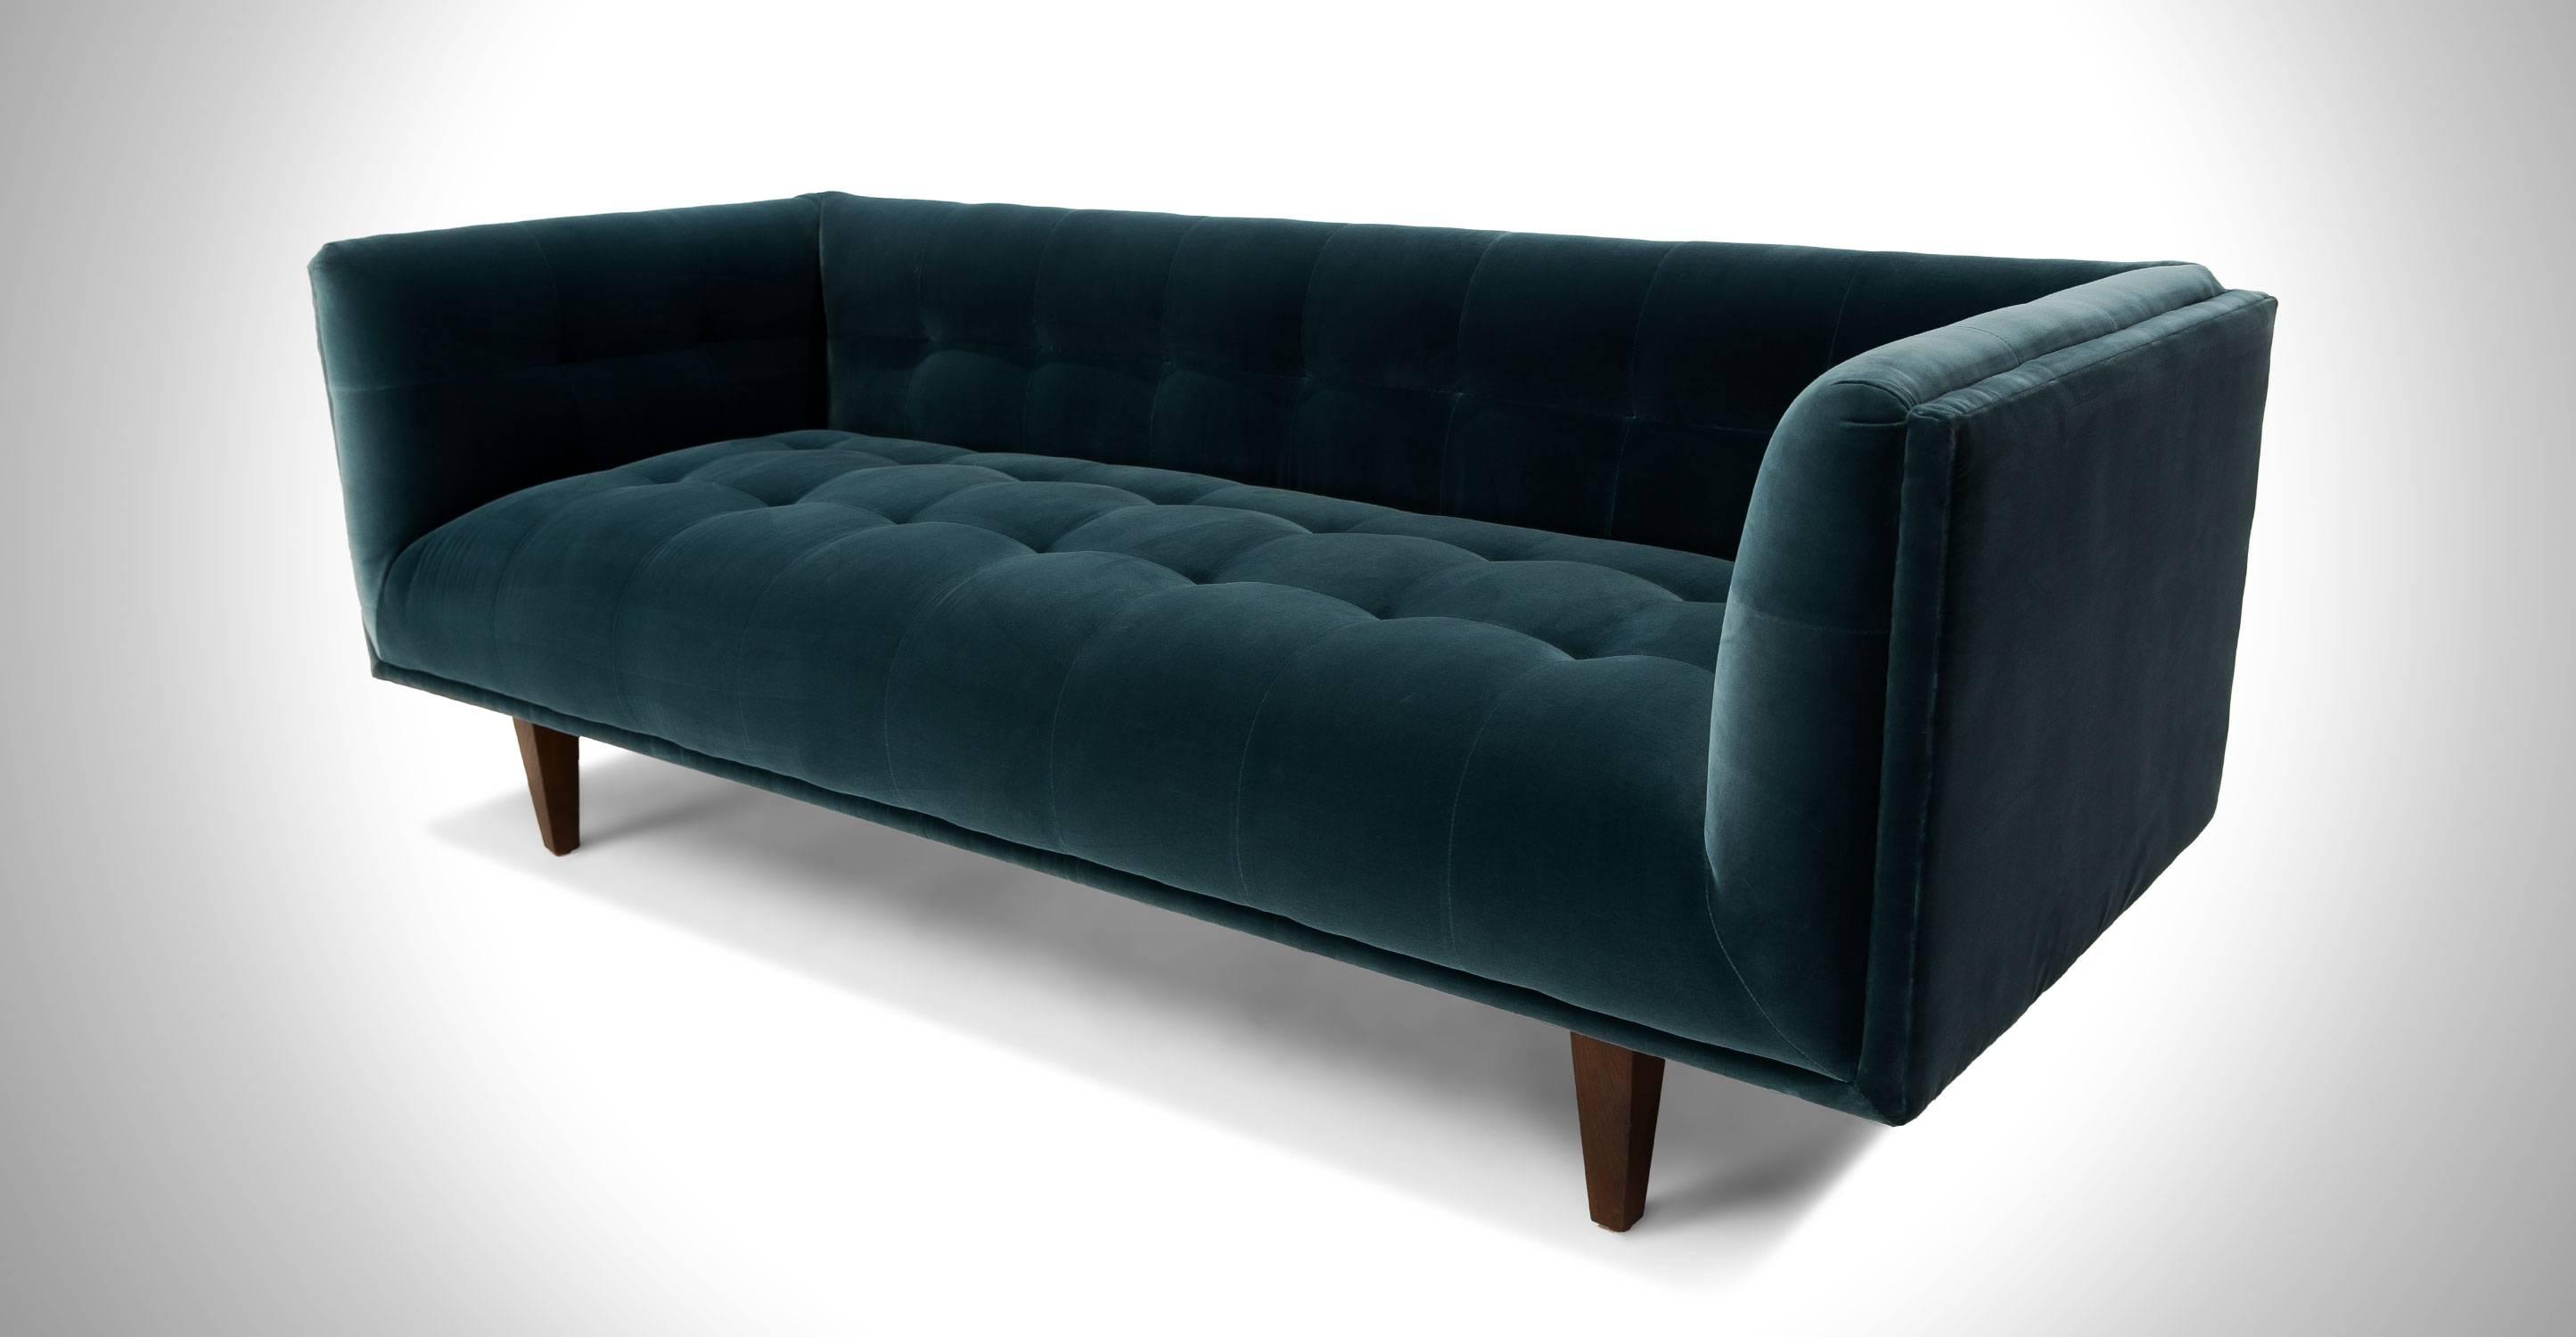 Blue Sofa   Tehranmix Decoration pertaining to Blue Tufted Sofas (Image 5 of 30)